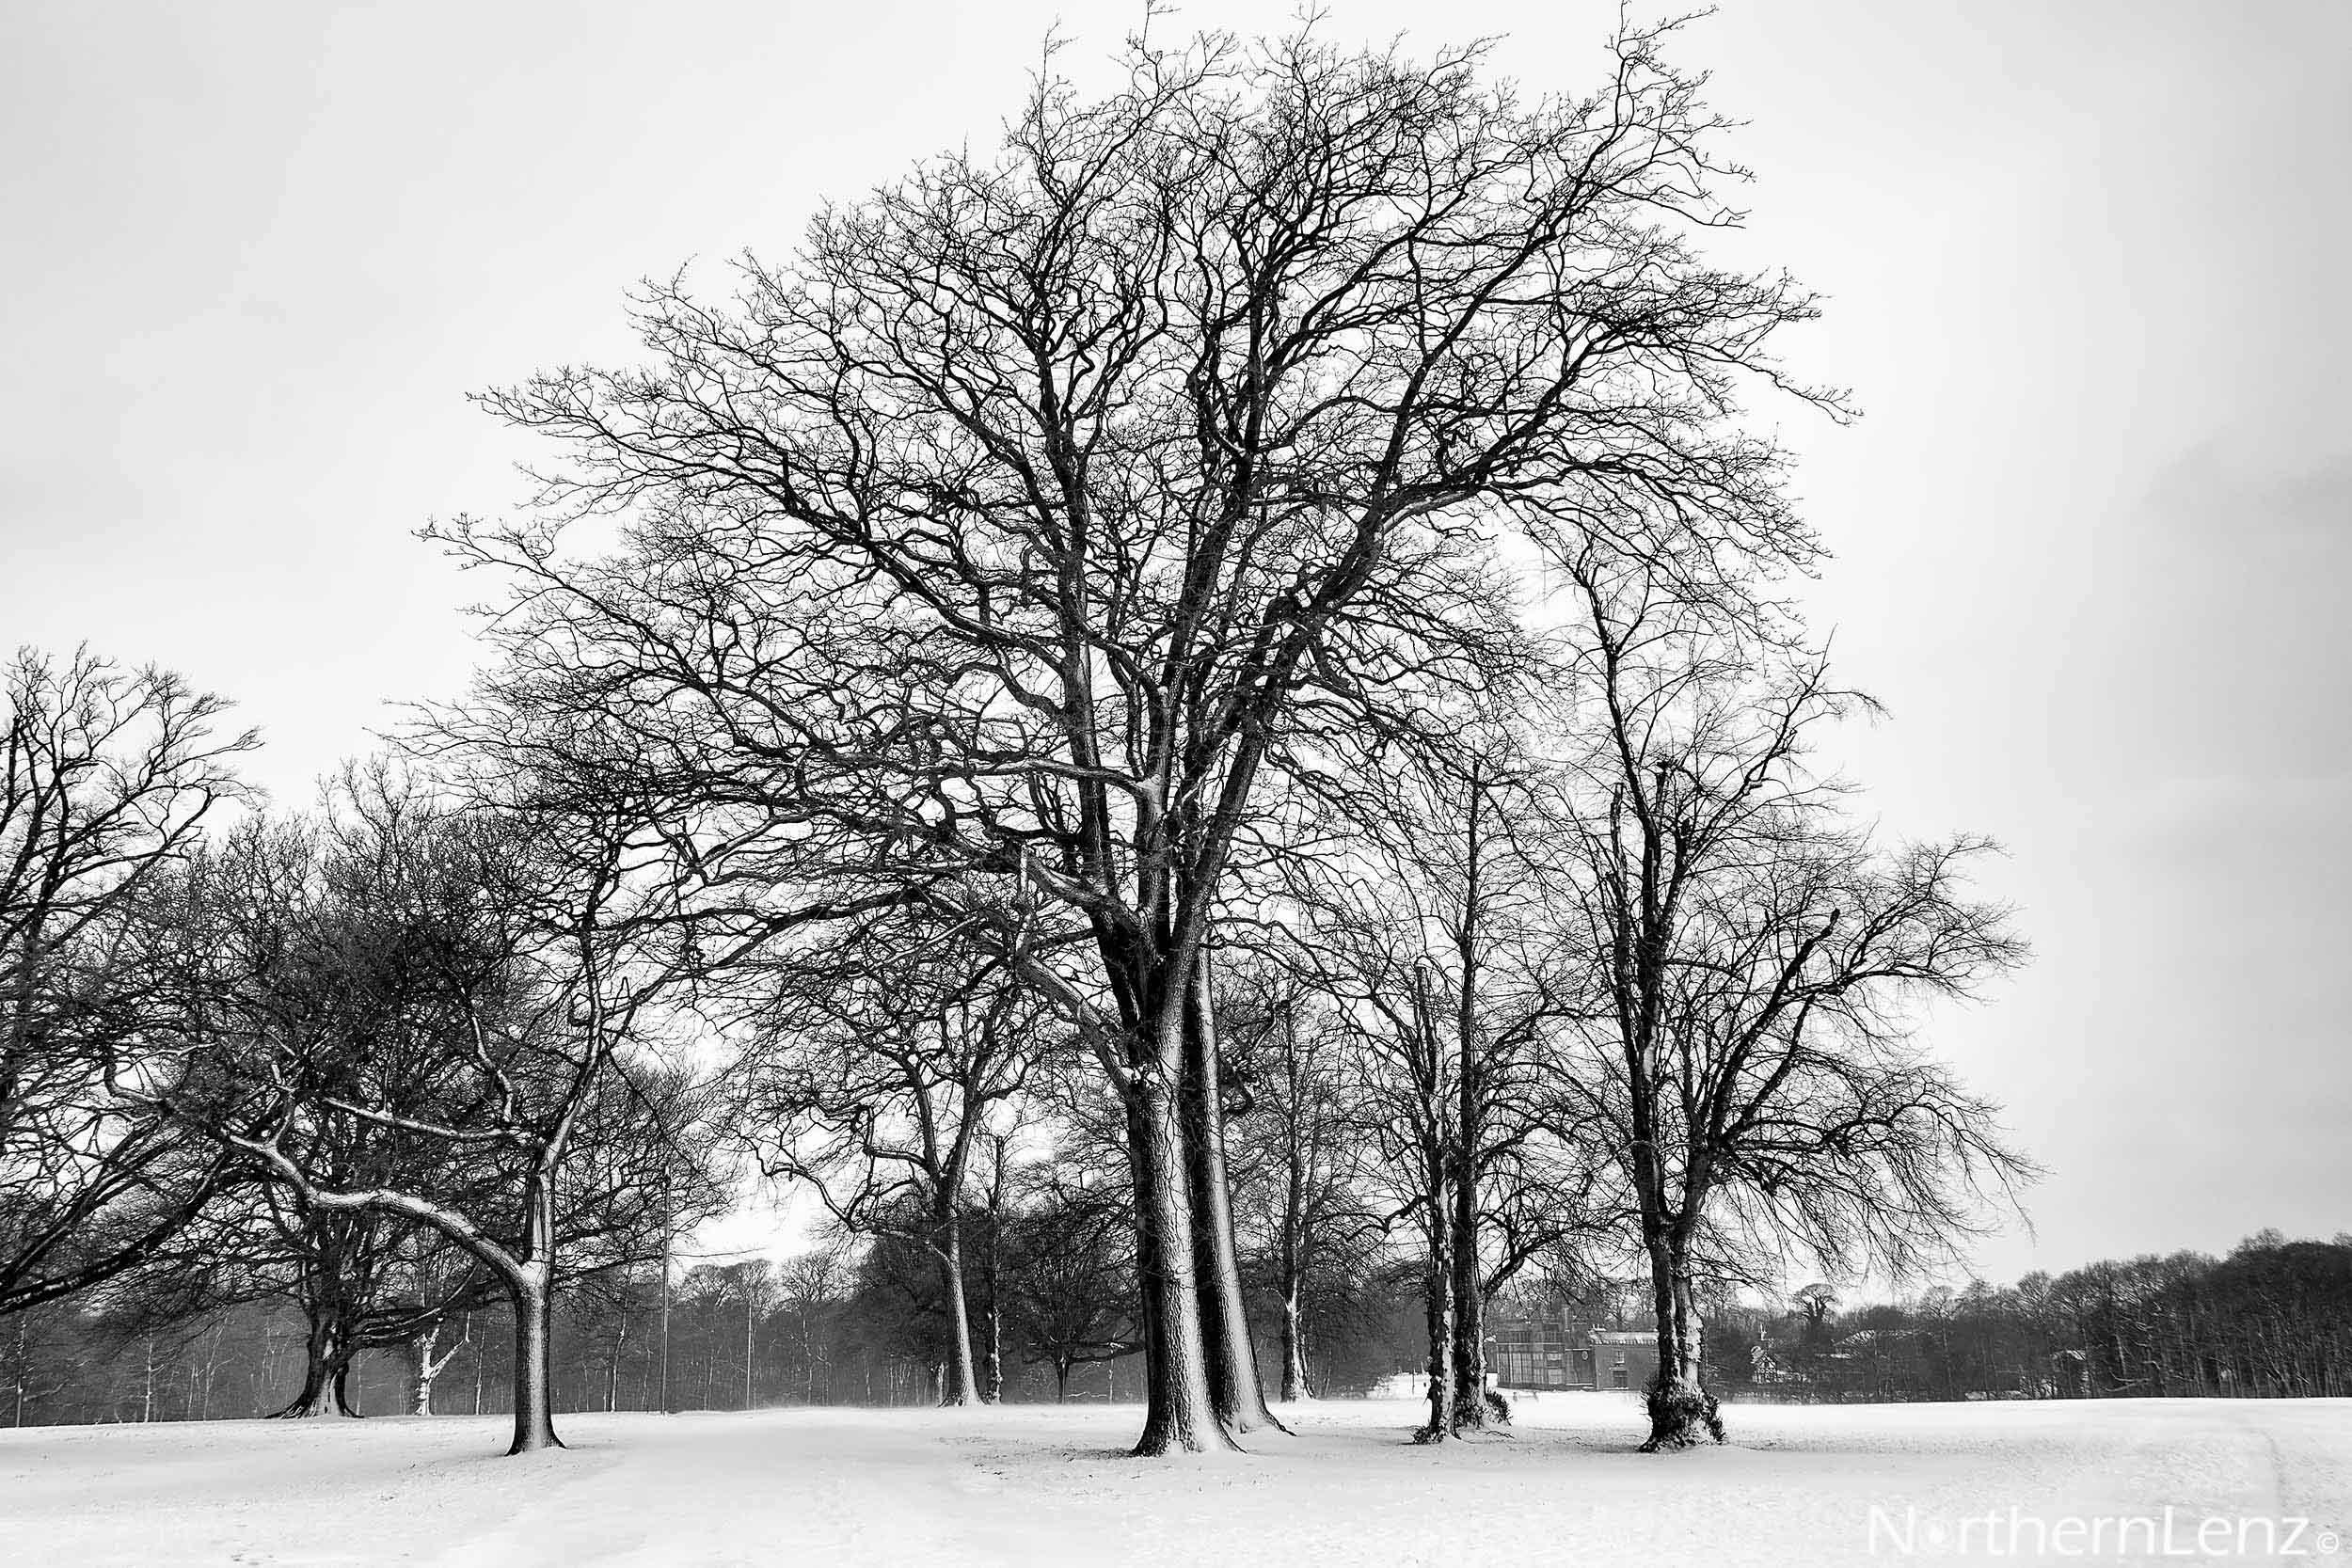 Wintry scene in the park  Image Ref: MT06